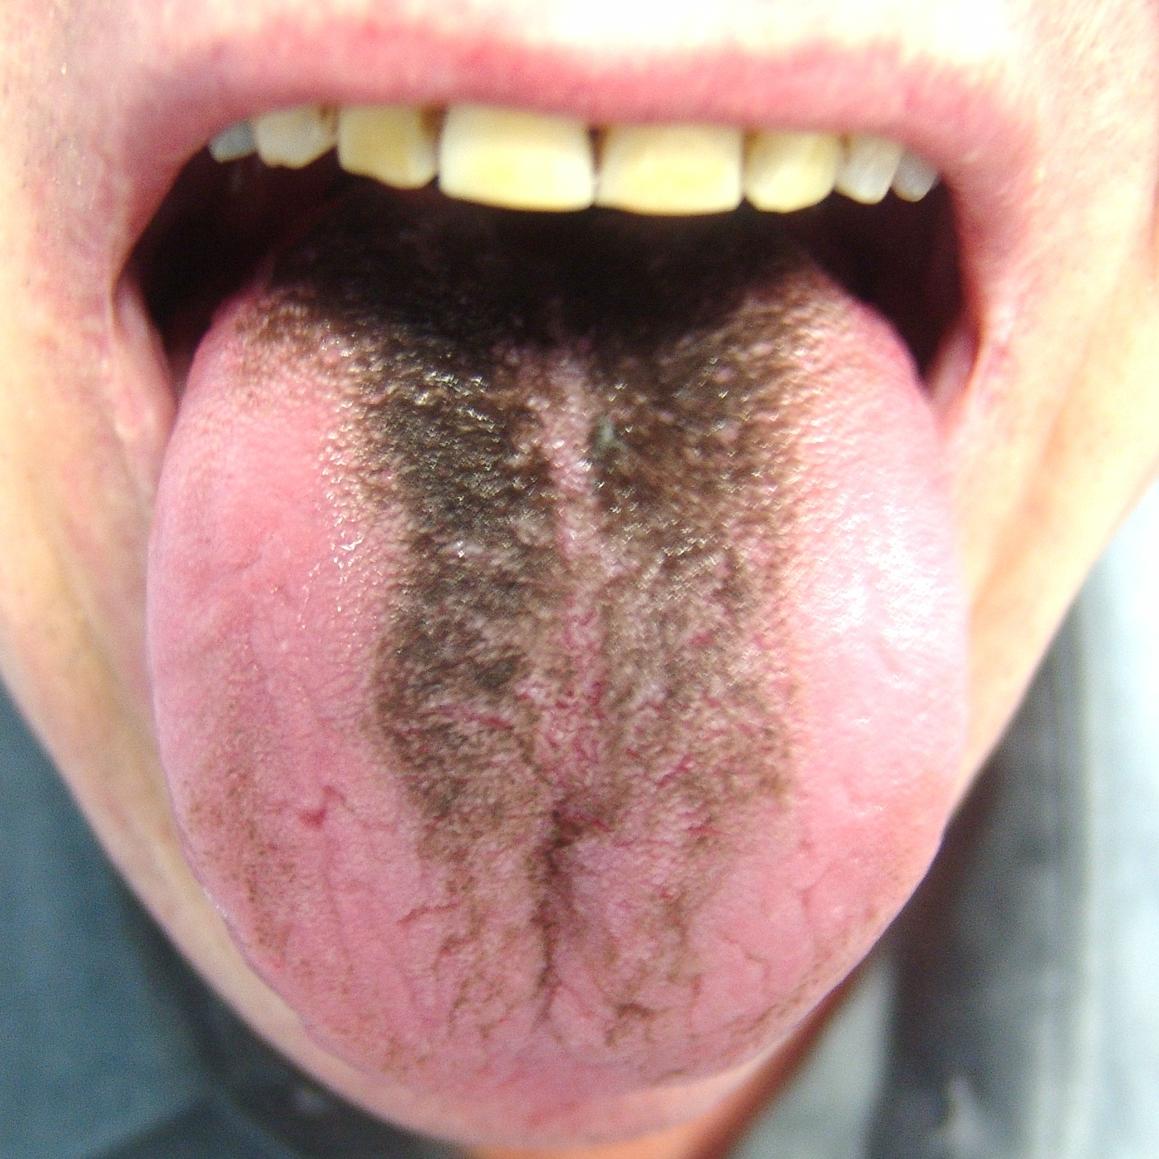 Black_Hairy_Tongue1.jpg